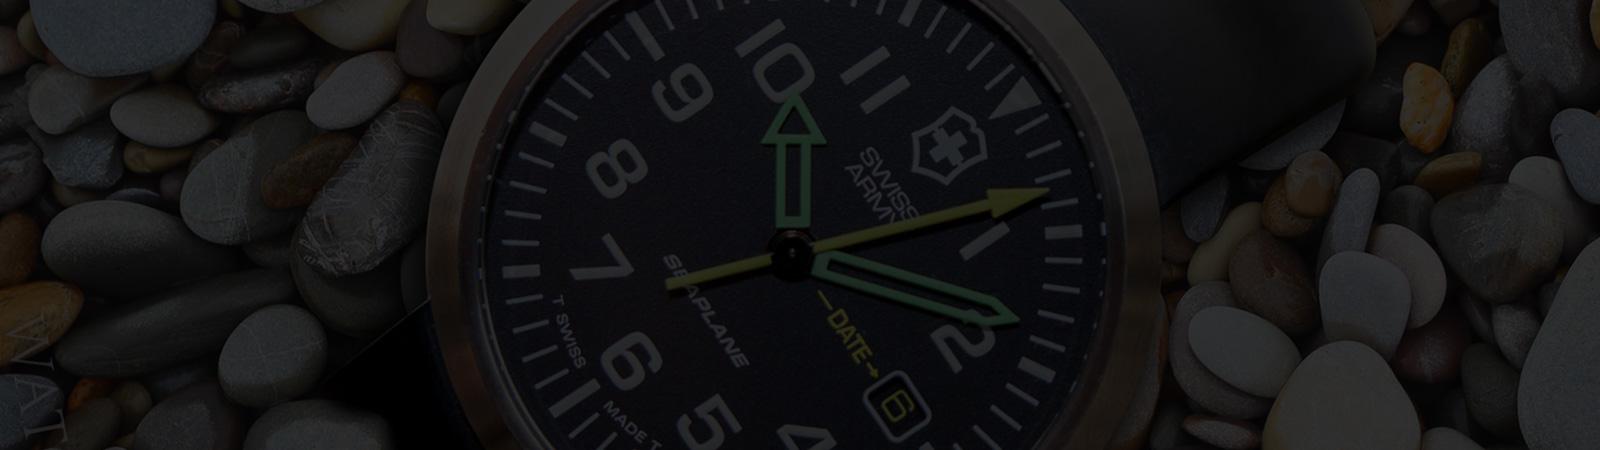 MEET THE WATCH: Victorinox Swiss Army Quartz SeaPlane Watches